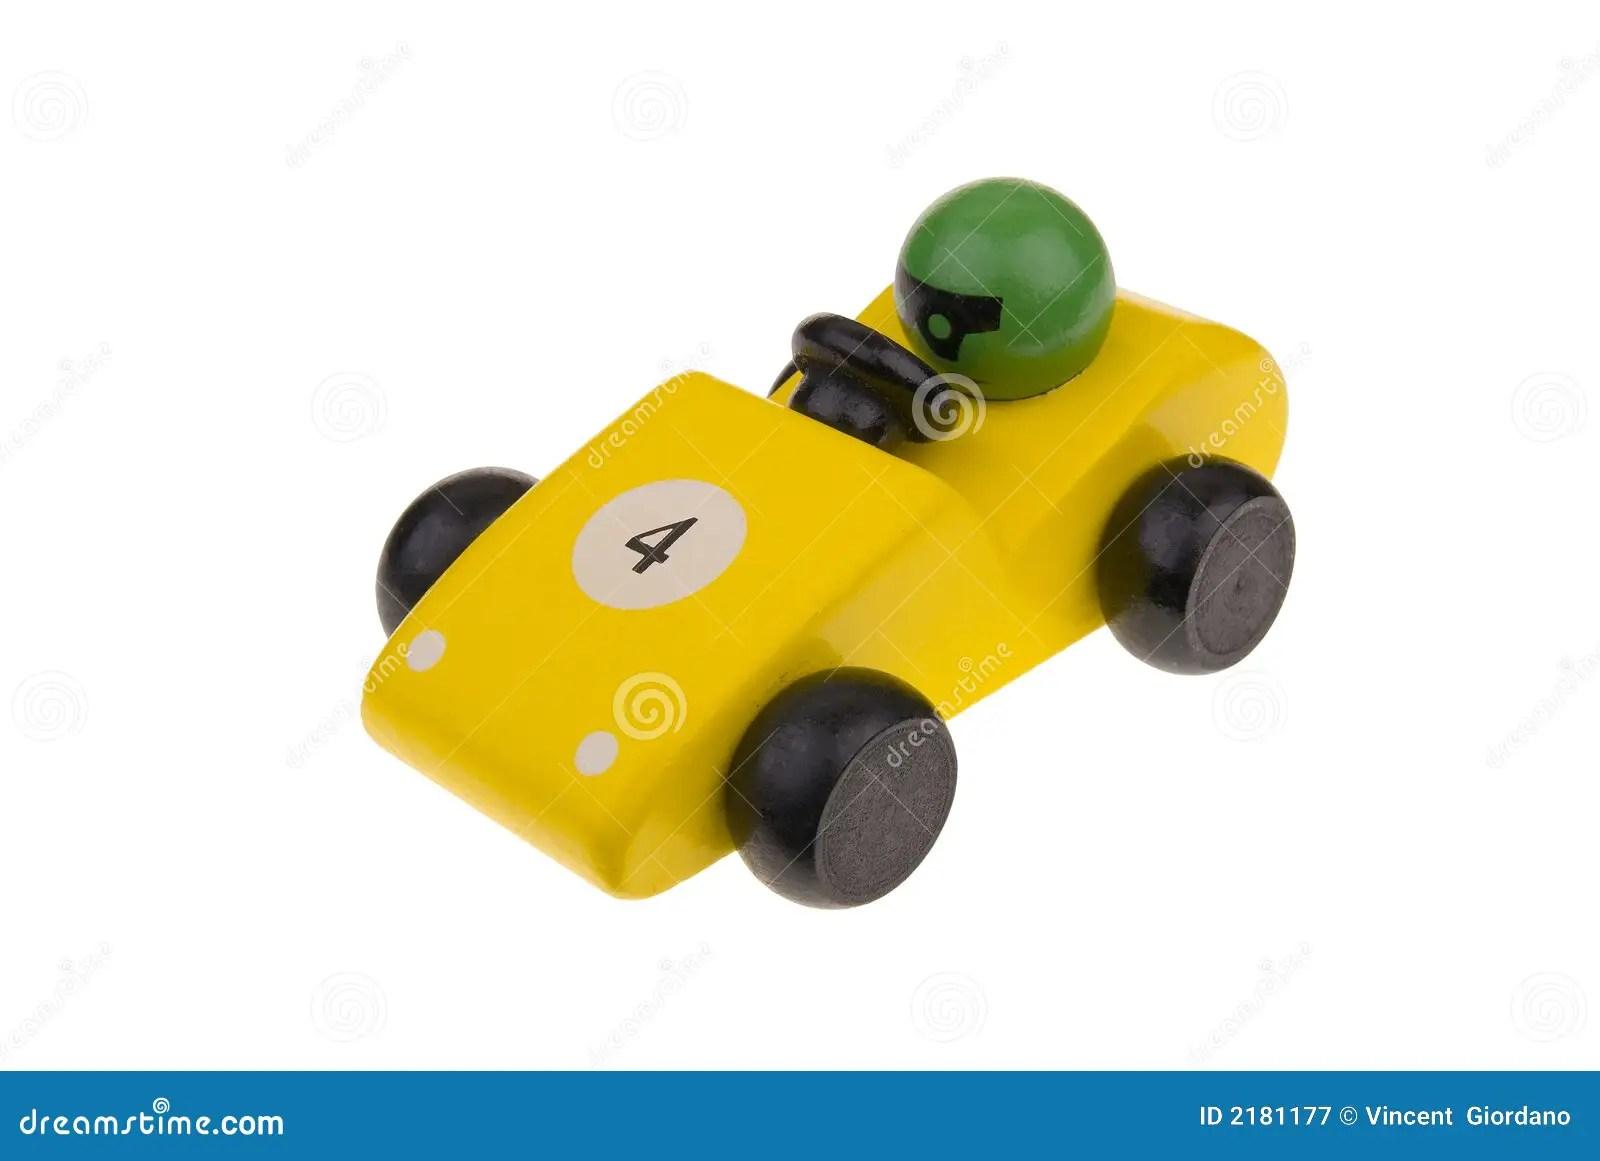 Yellow Wooden Toy Race Car Stock Image Image Of Preschool